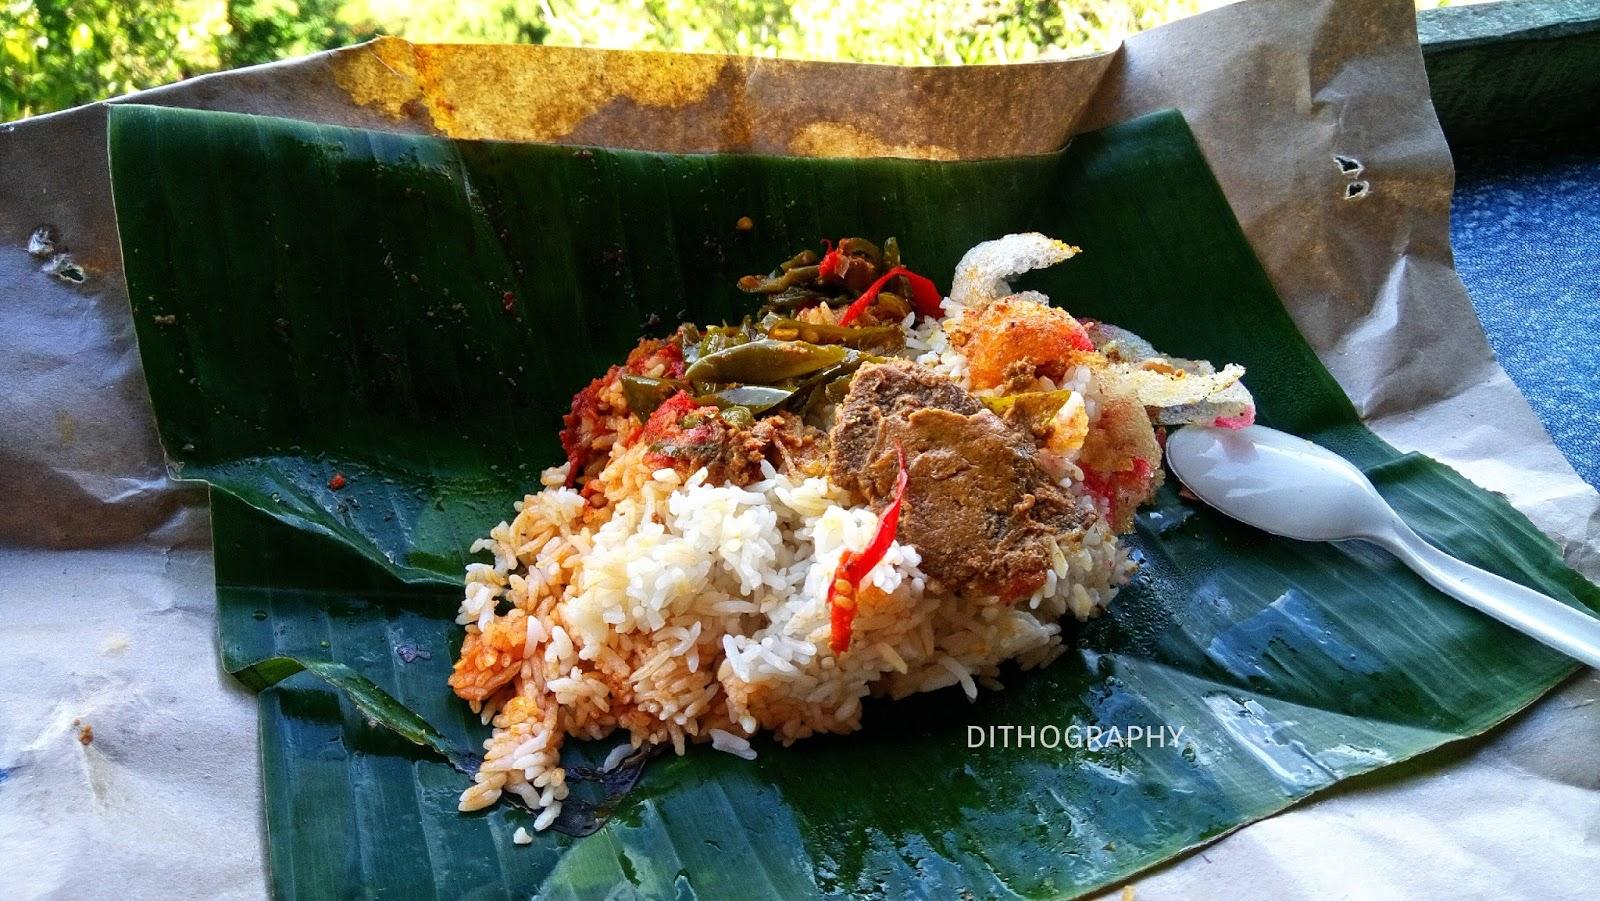 Wisata Kuliner Di Banda Aceh Indonesia Jagungmanis Jalan Jalan